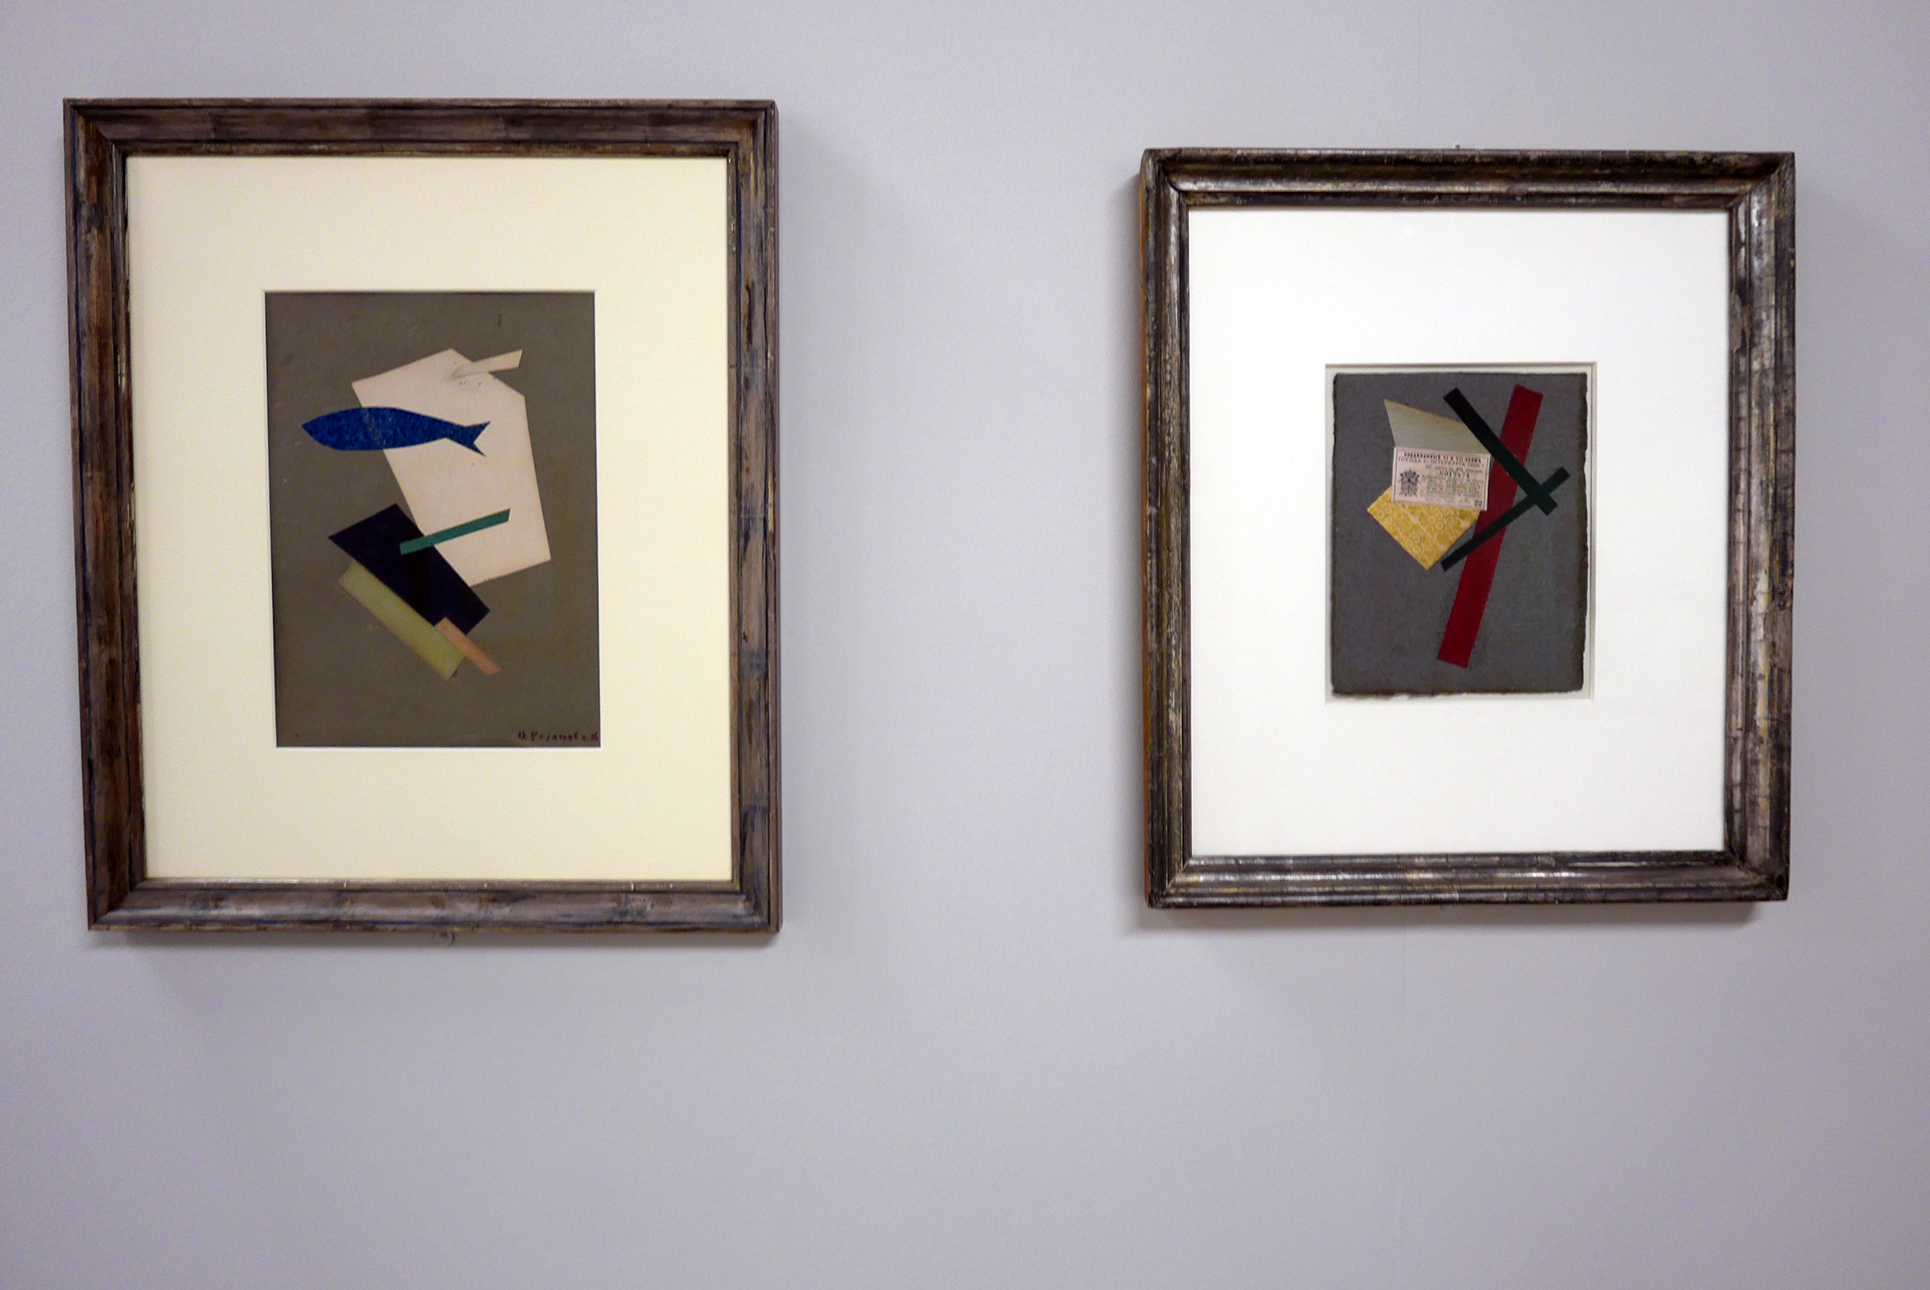 Links: Ol'ga Rozanova, Ohne Titel, 1916 Collage aus farbigem Papier auf grauem Karton 32 x 33,5 cm  Rechts: Varvara Stepanova, Abstrakte Komposition, 1919-1920 21,3 x 17 cm